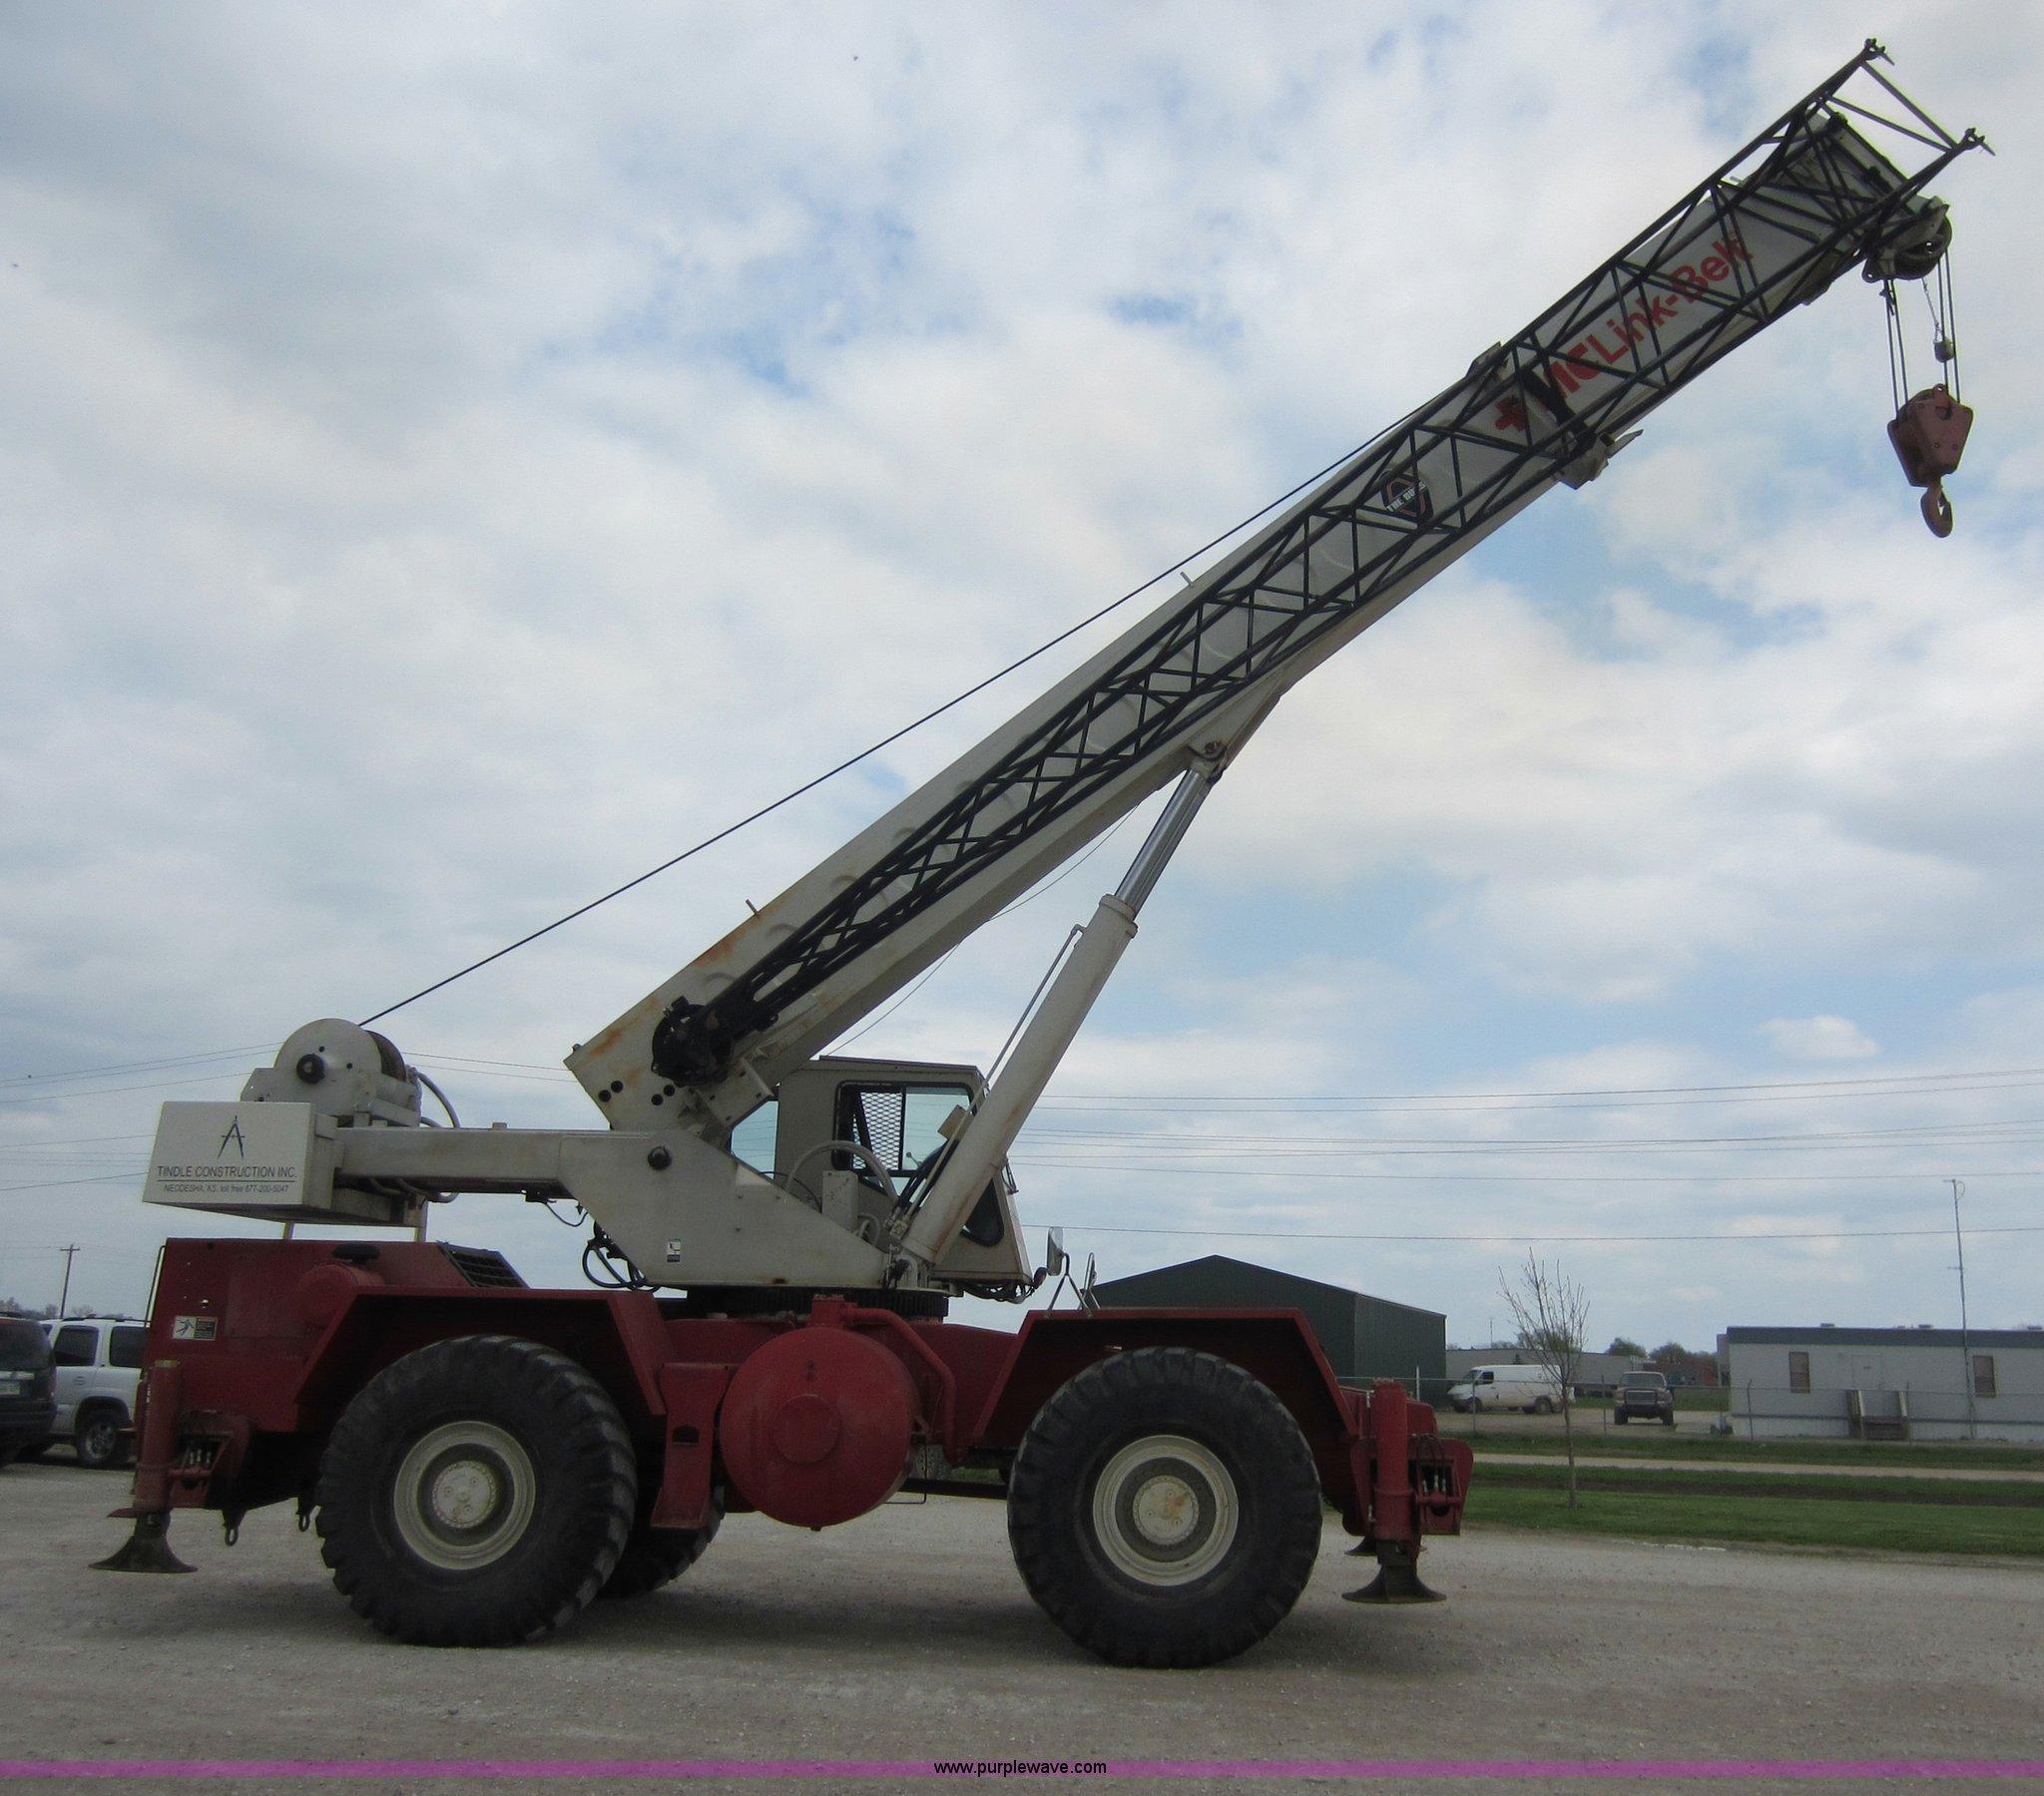 ... Link-belt HSP-8040 40 ton rough terrain Full size in new window ...